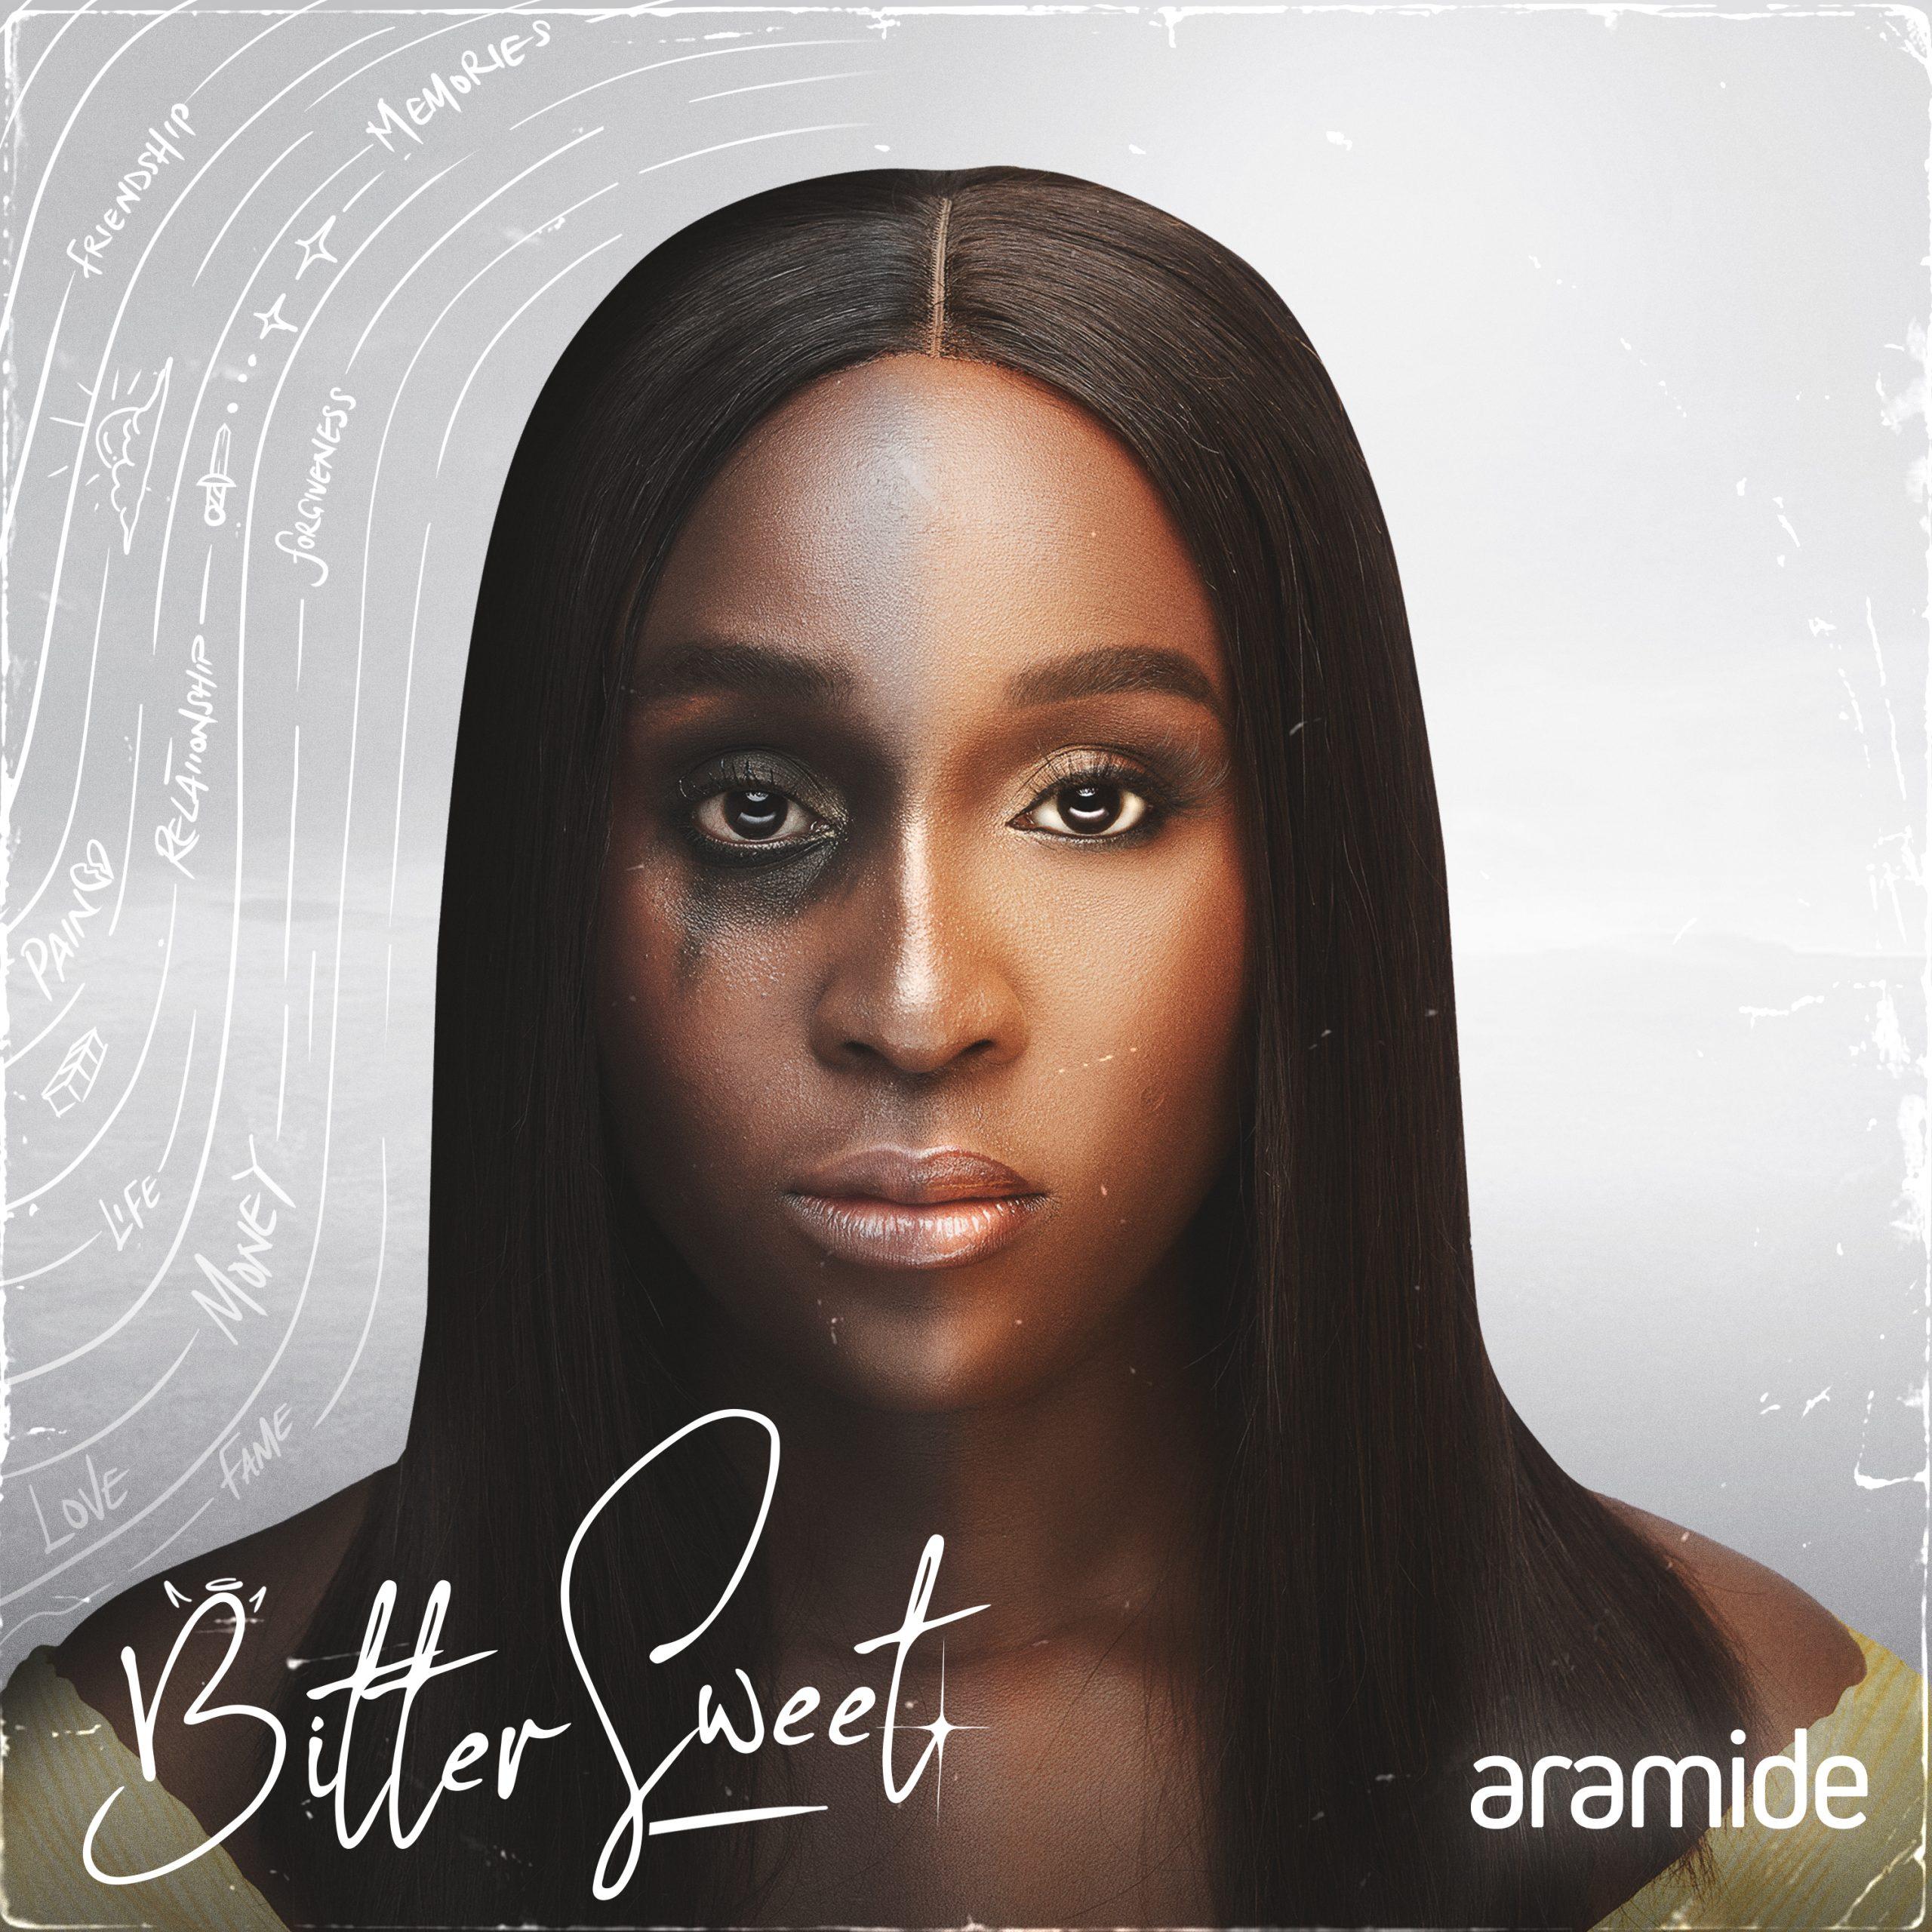 Aramide – Bittersweet (EP) mp3 download